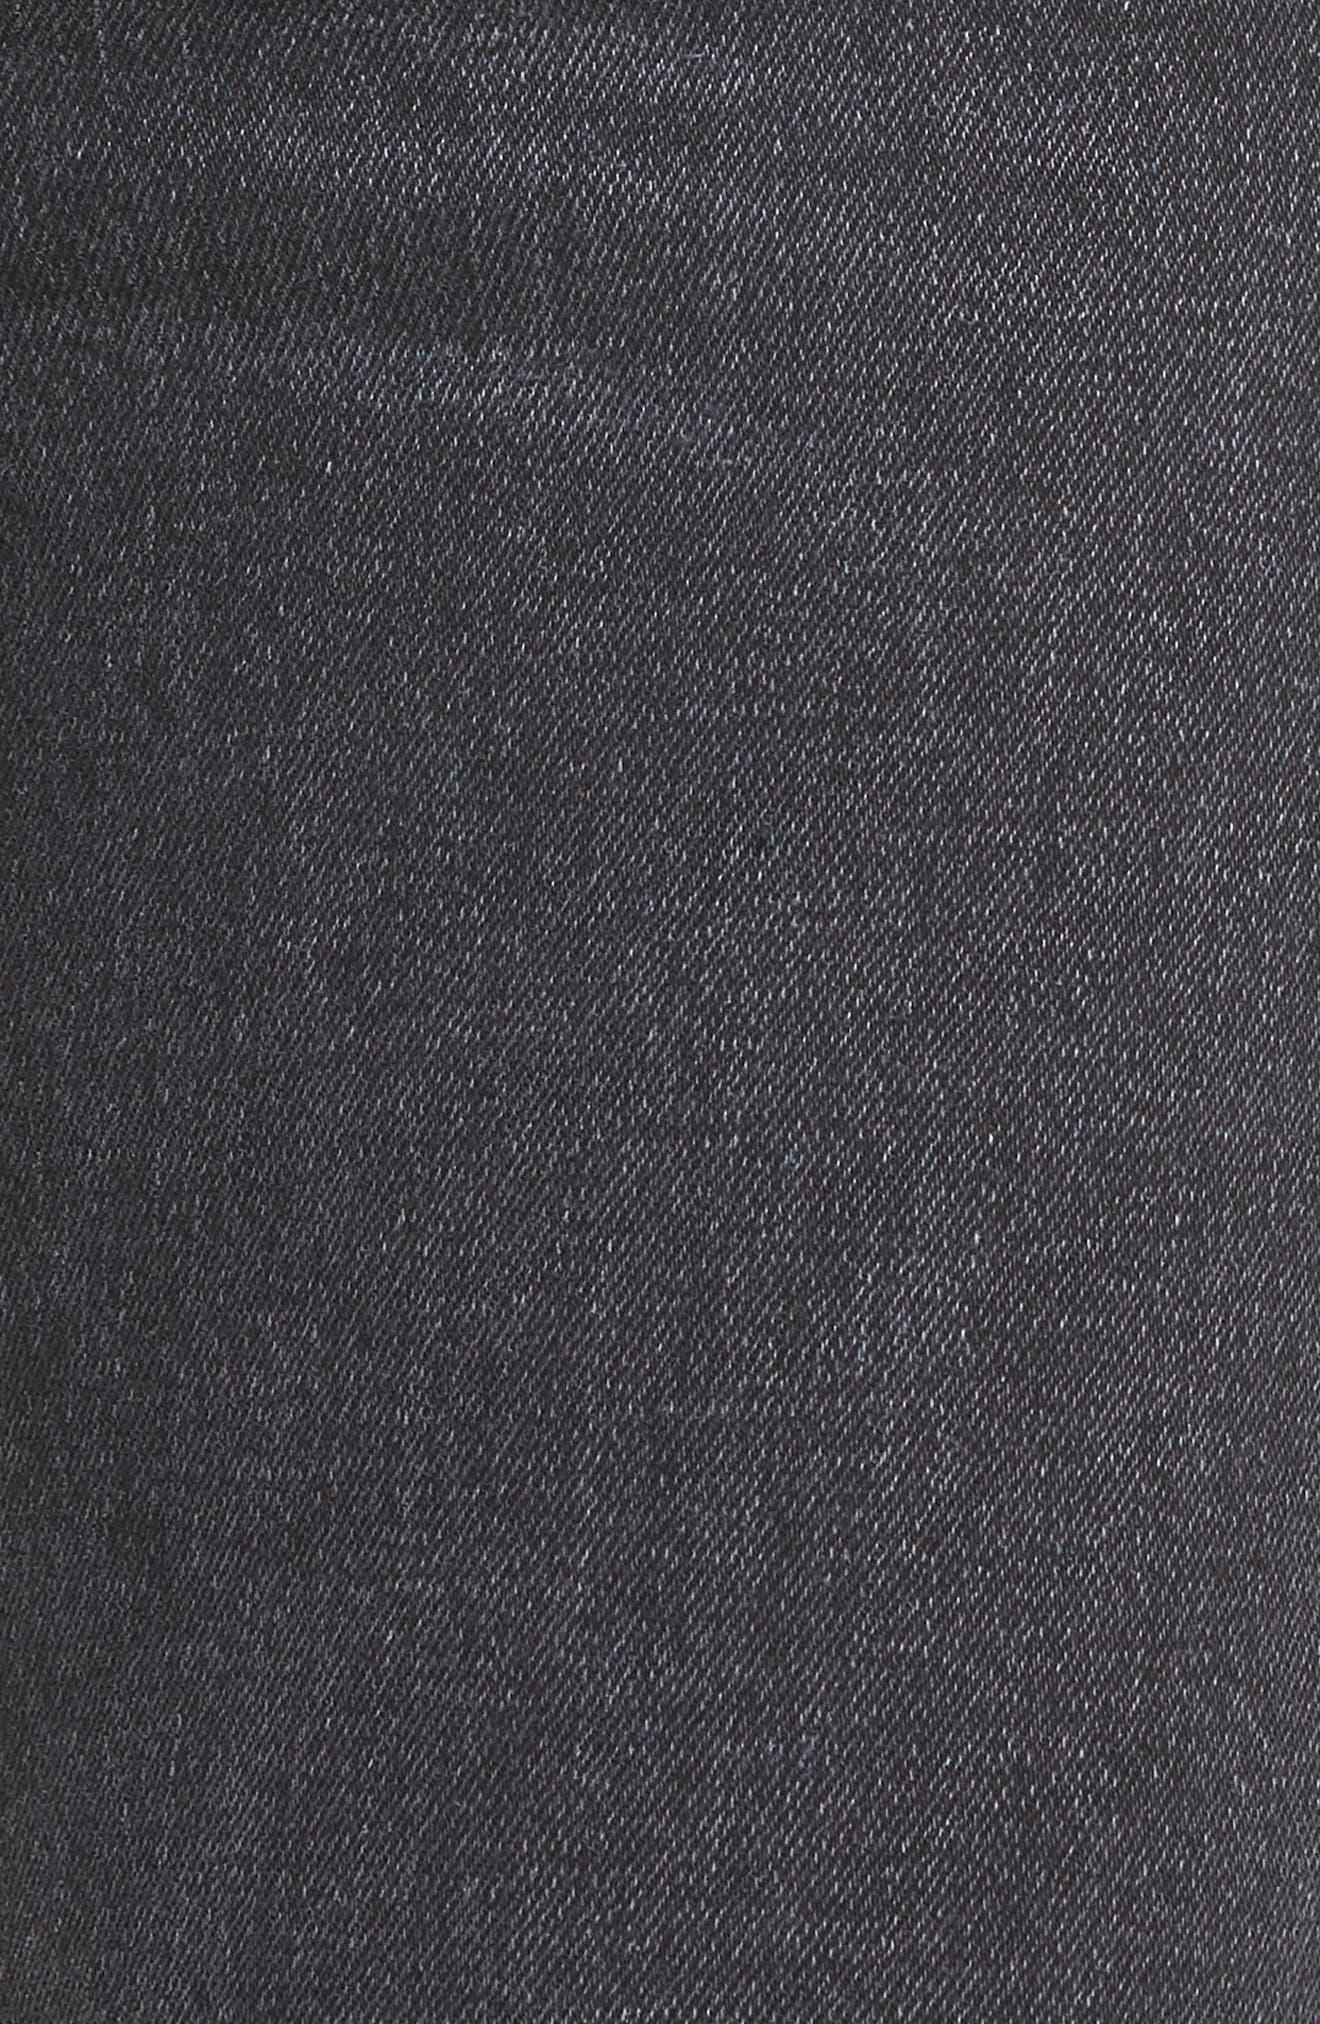 Heartbreaker High Waist Bootcut Jeans,                             Alternate thumbnail 5, color,                             001